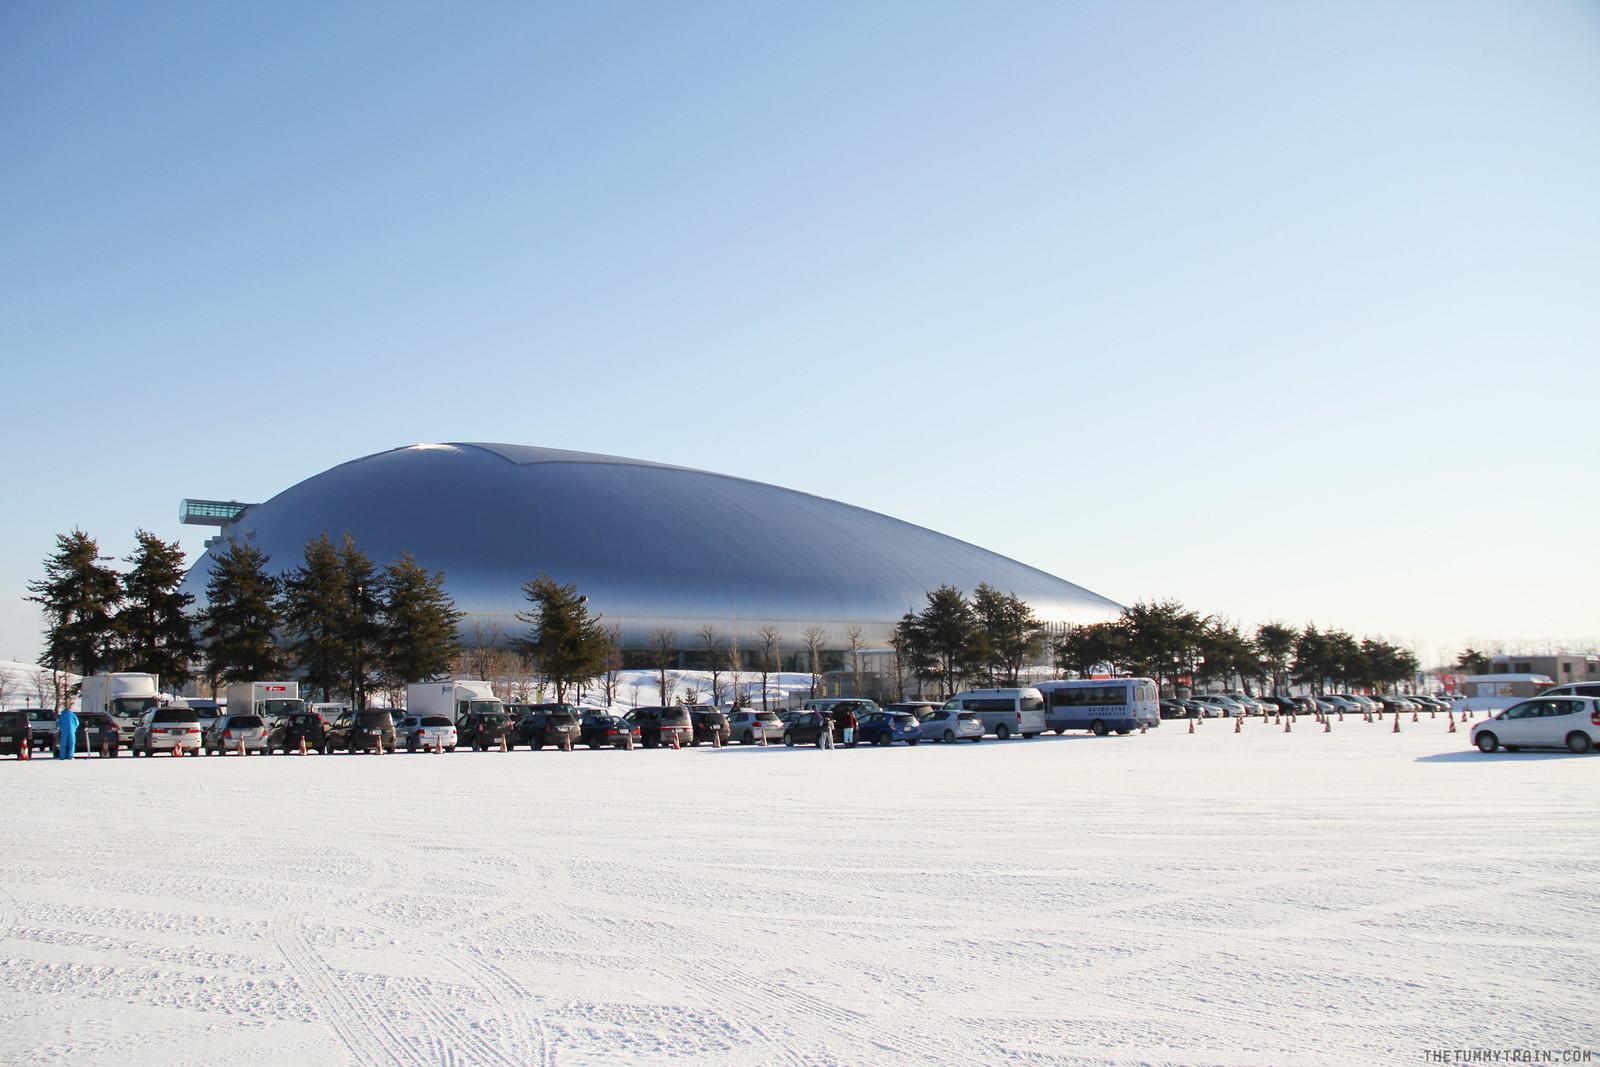 32793086301 1ec571ae7b h - Sapporo Snow And Smile: 8 Unforgettable Winter Experiences in Sapporo City